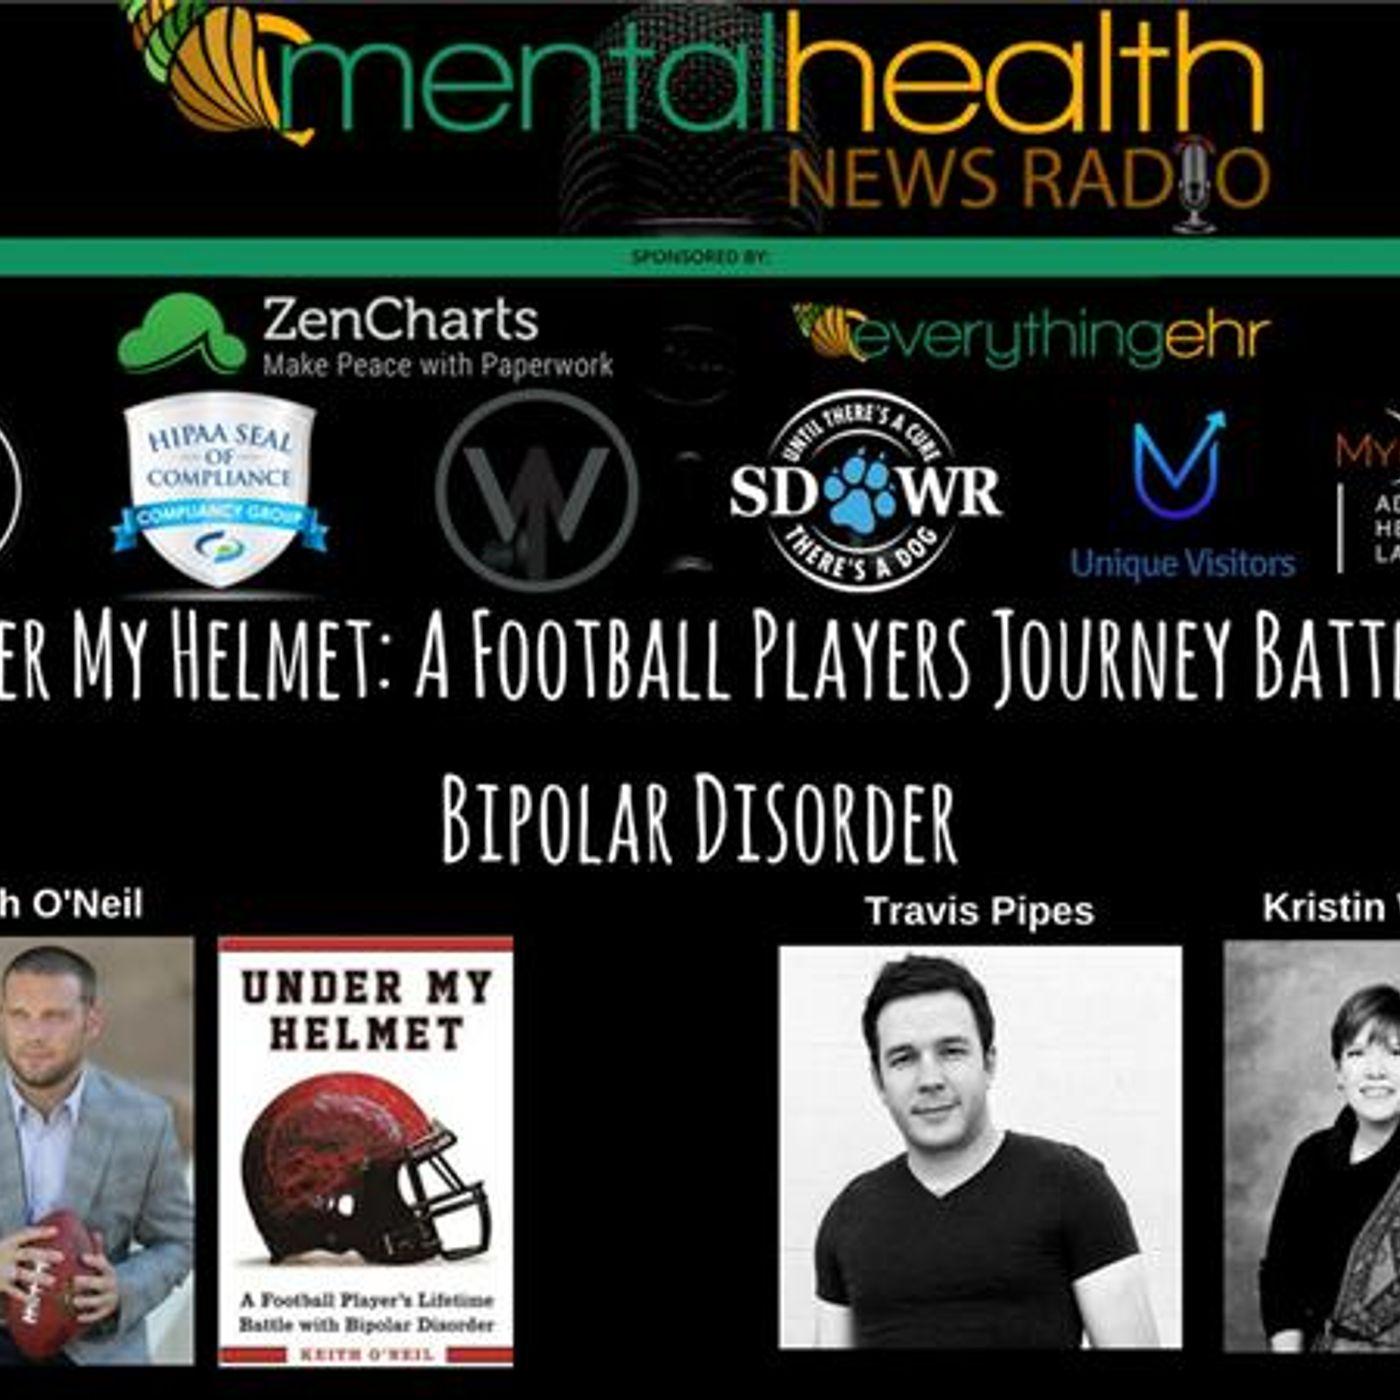 Mental Health News Radio - Under My Helmet: Football Player Keith O'Neil On Battling Bipolar Disorder